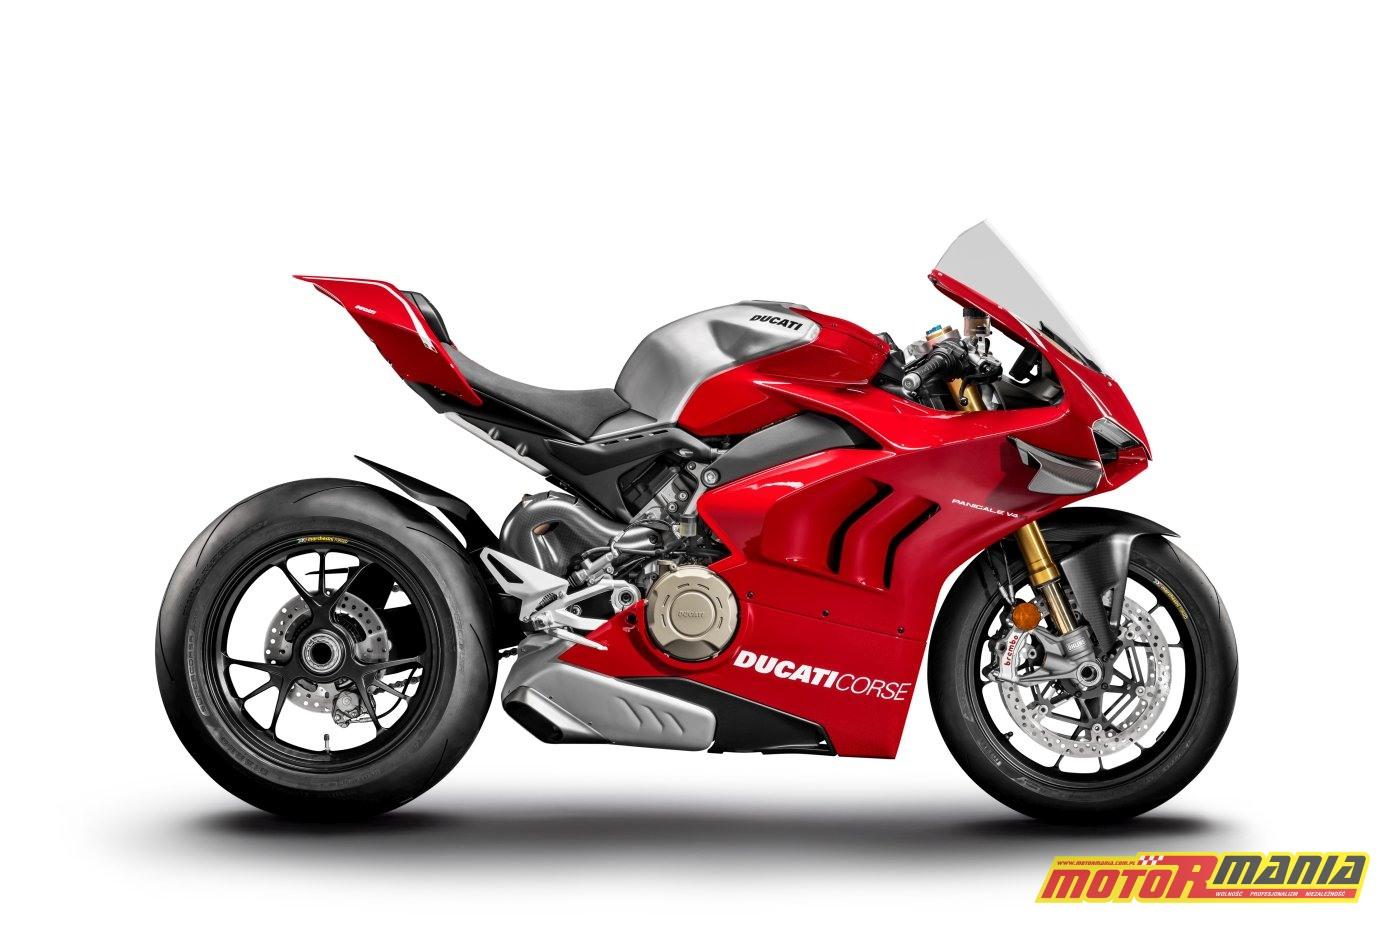 Ducati Panigale V4 R 2019 (9)